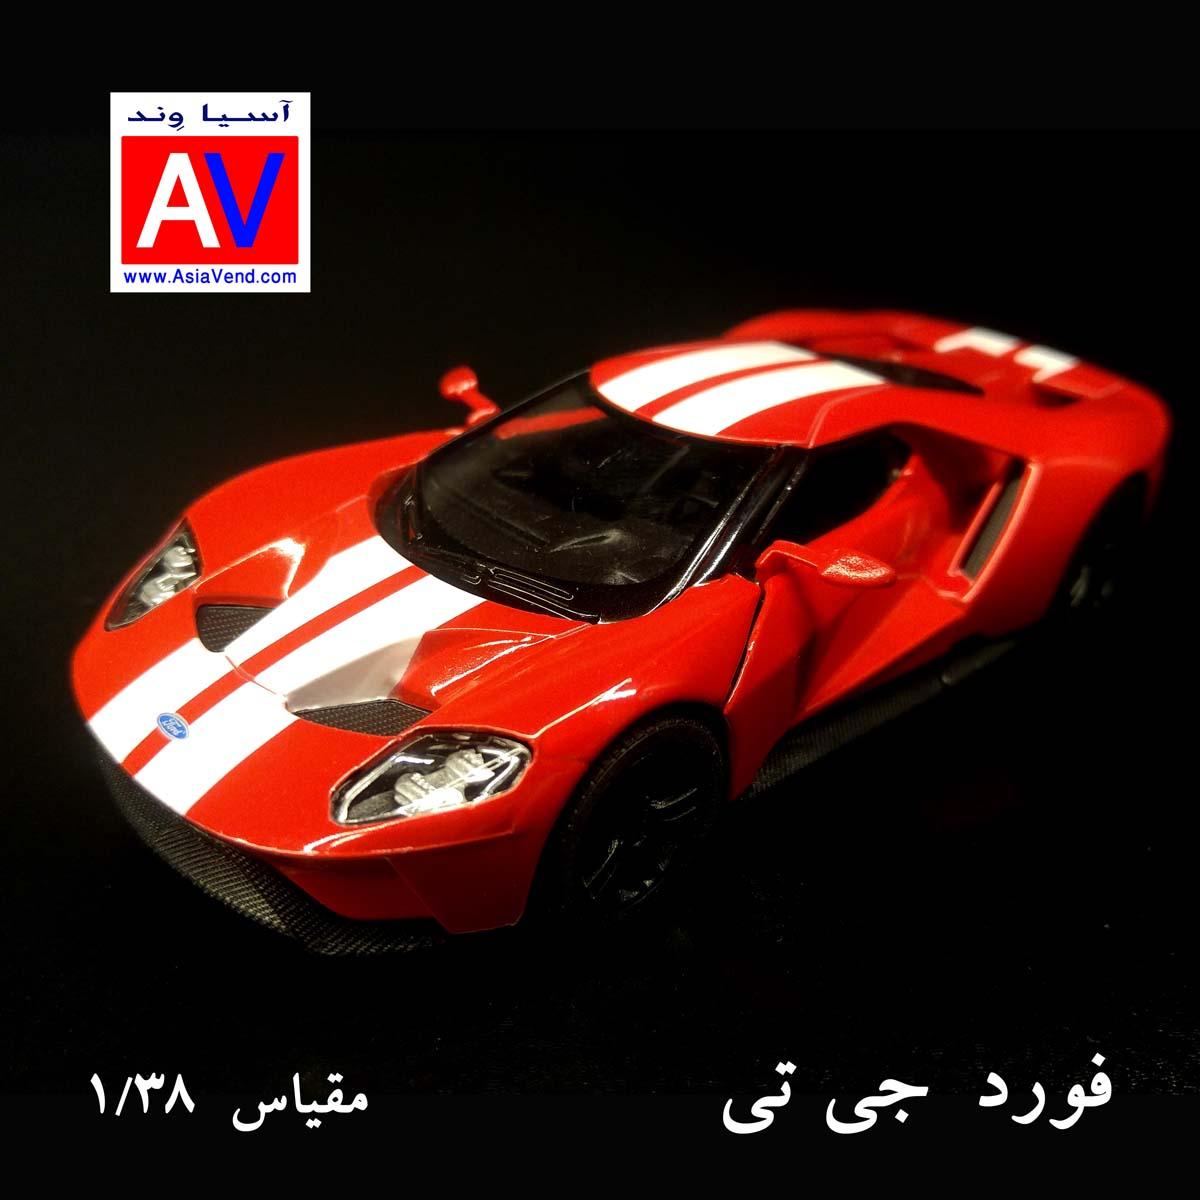 خرید ماکت ماشین آمریکایی ماکت ماشین فلزی فورد مقیاس 1/32 رنگ قرمز Ford GT Model Car